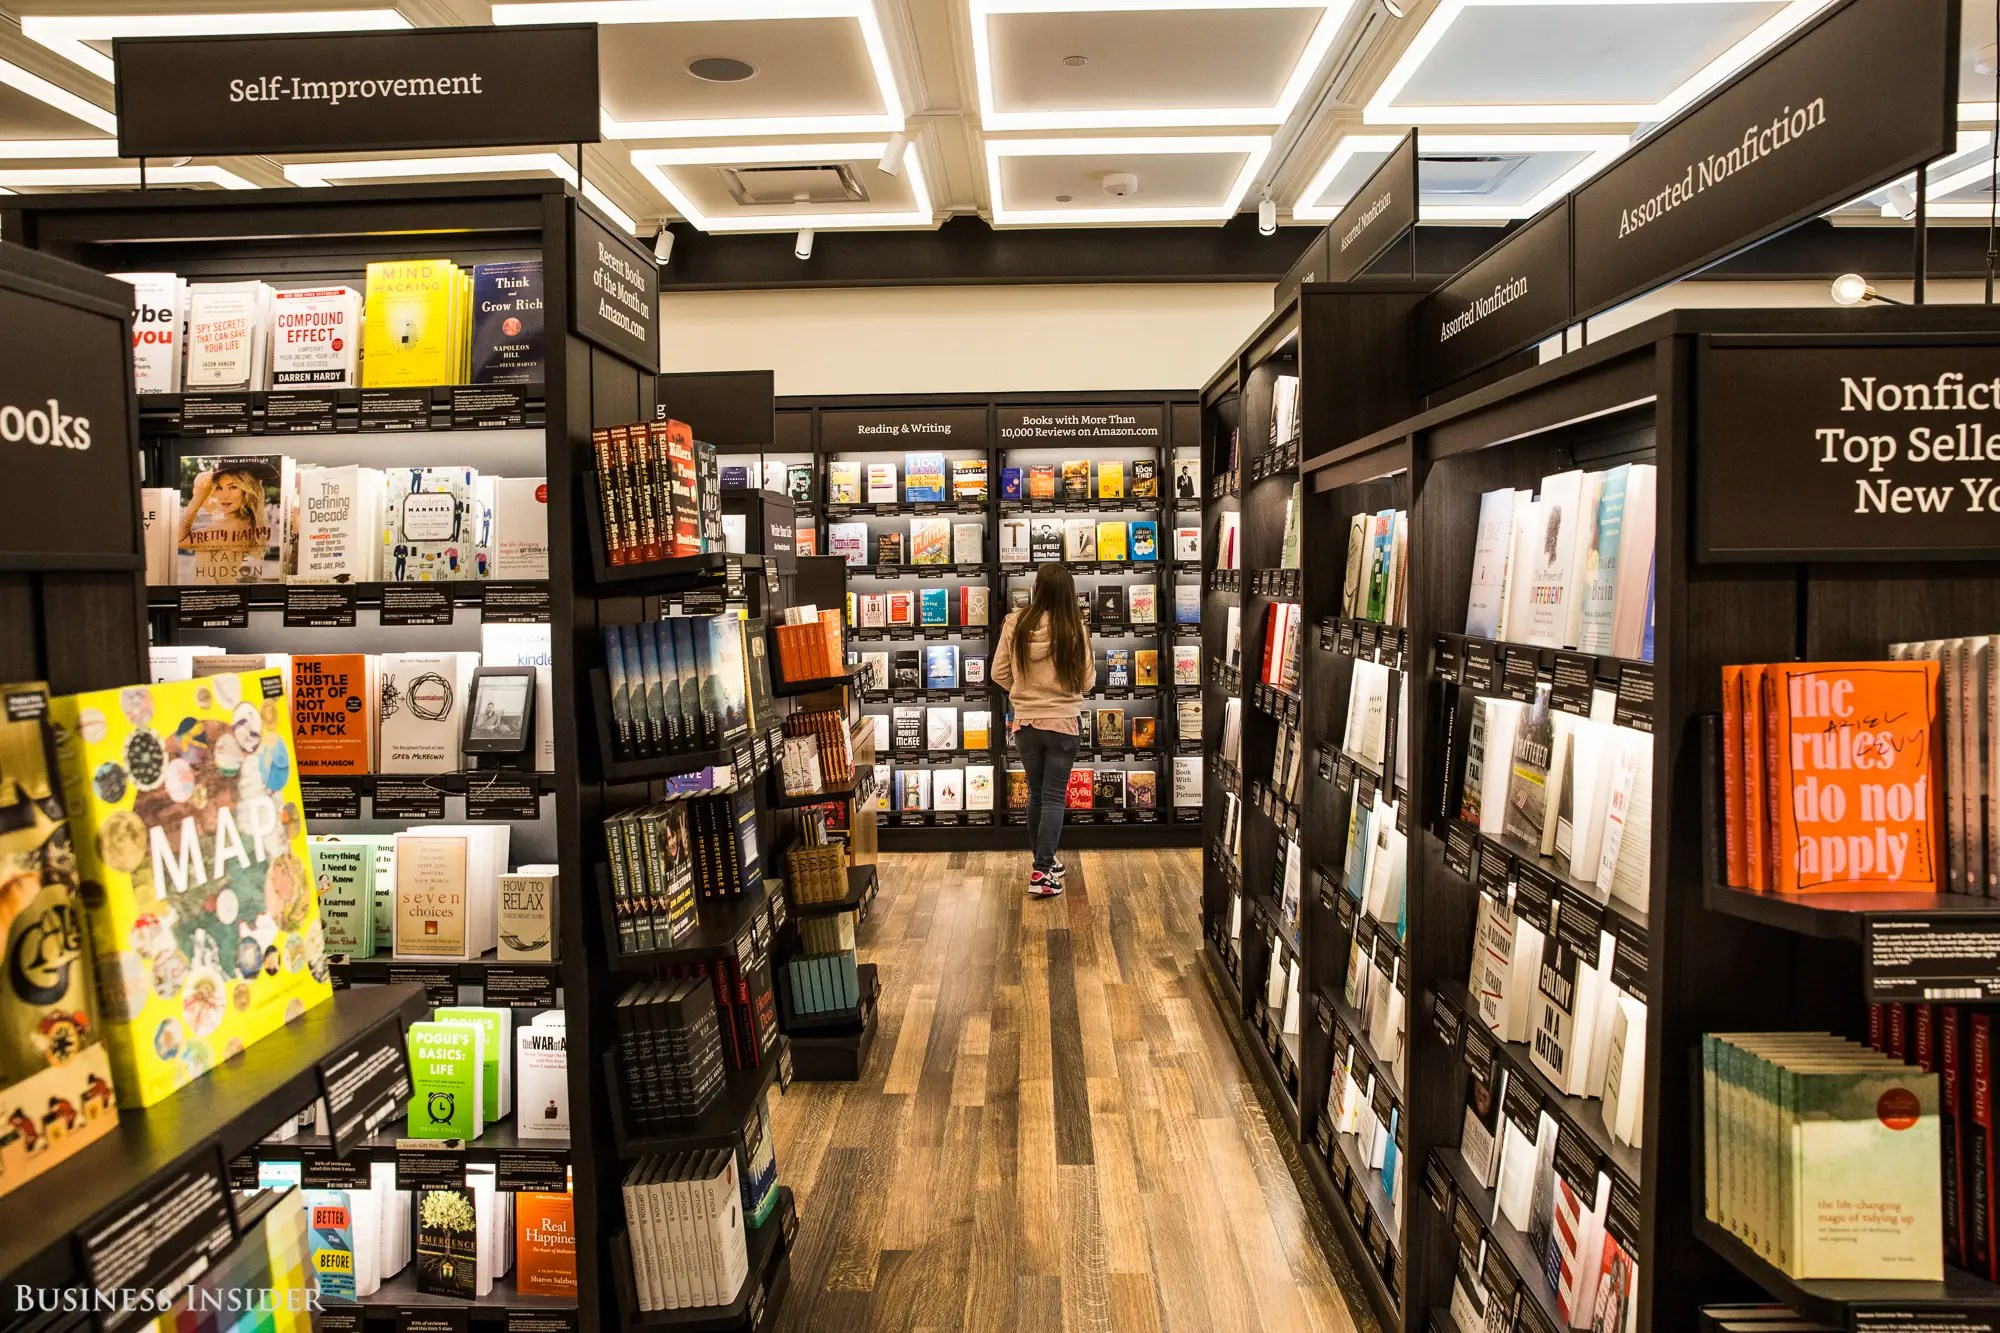 Amazon Books New York City Location Photos